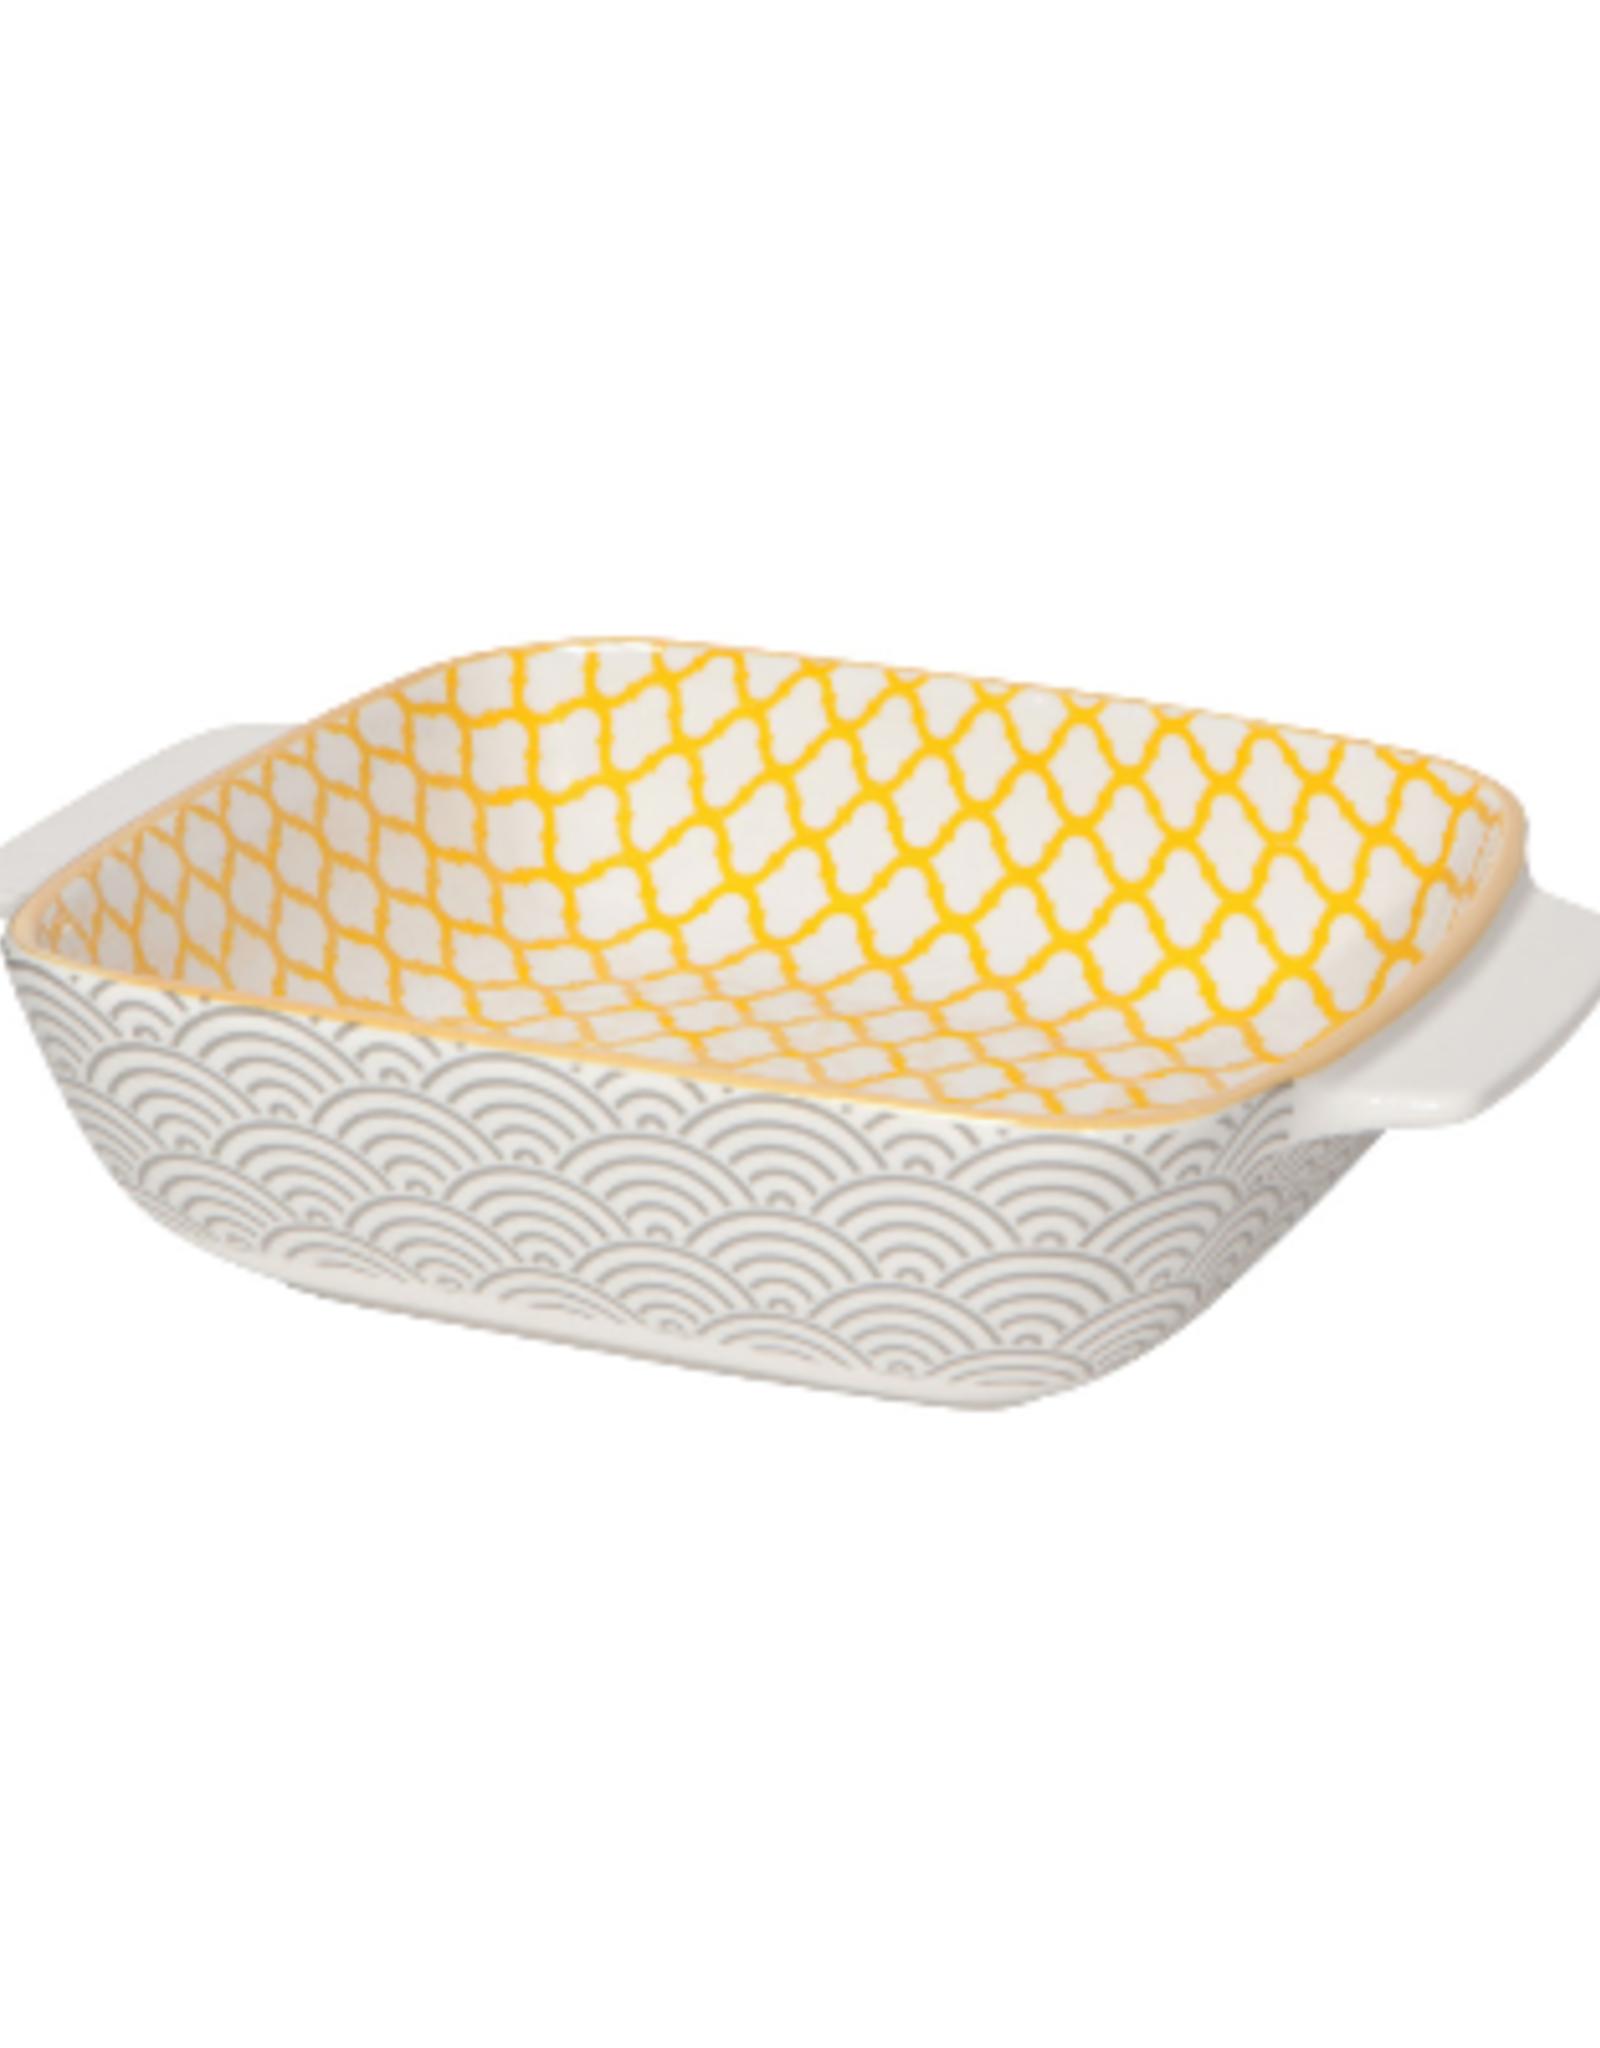 Now Designs S19 Square Baking Dish, Sunstone, Lg